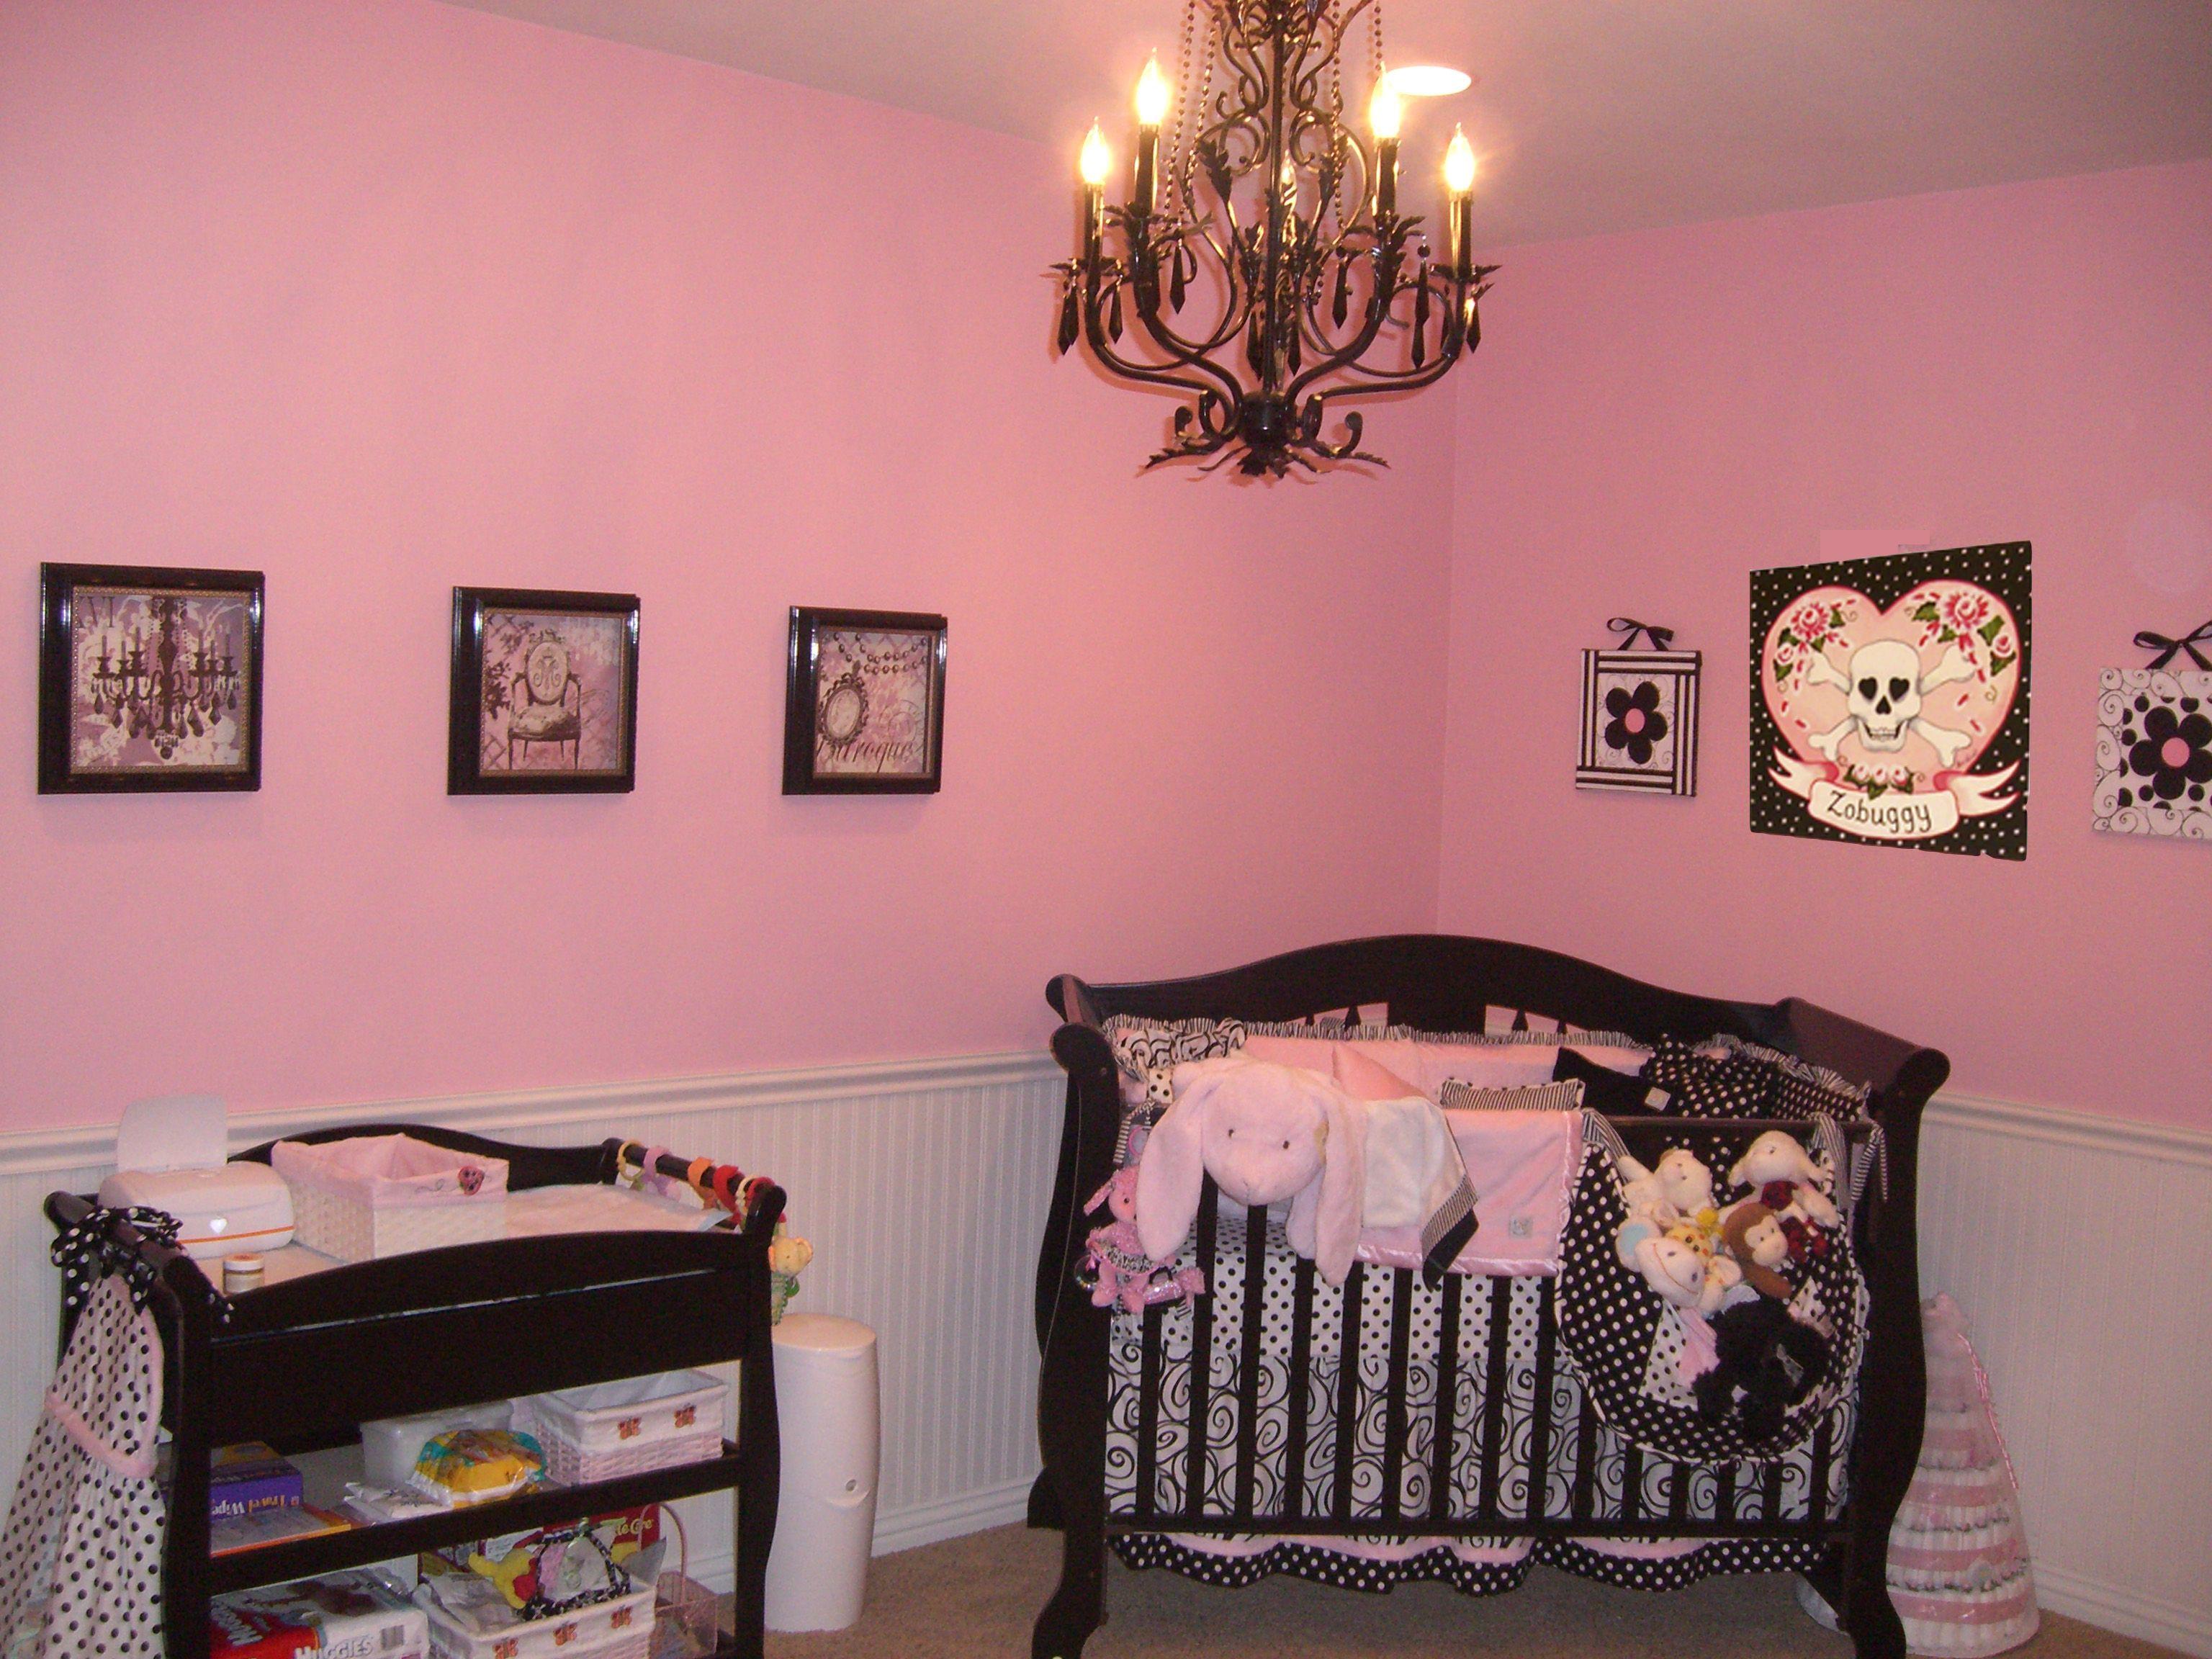 Nursery Design Trends Advice From Celebrity Designer: Celebrity Nursery In Pink And Black For Jodie Sweetin